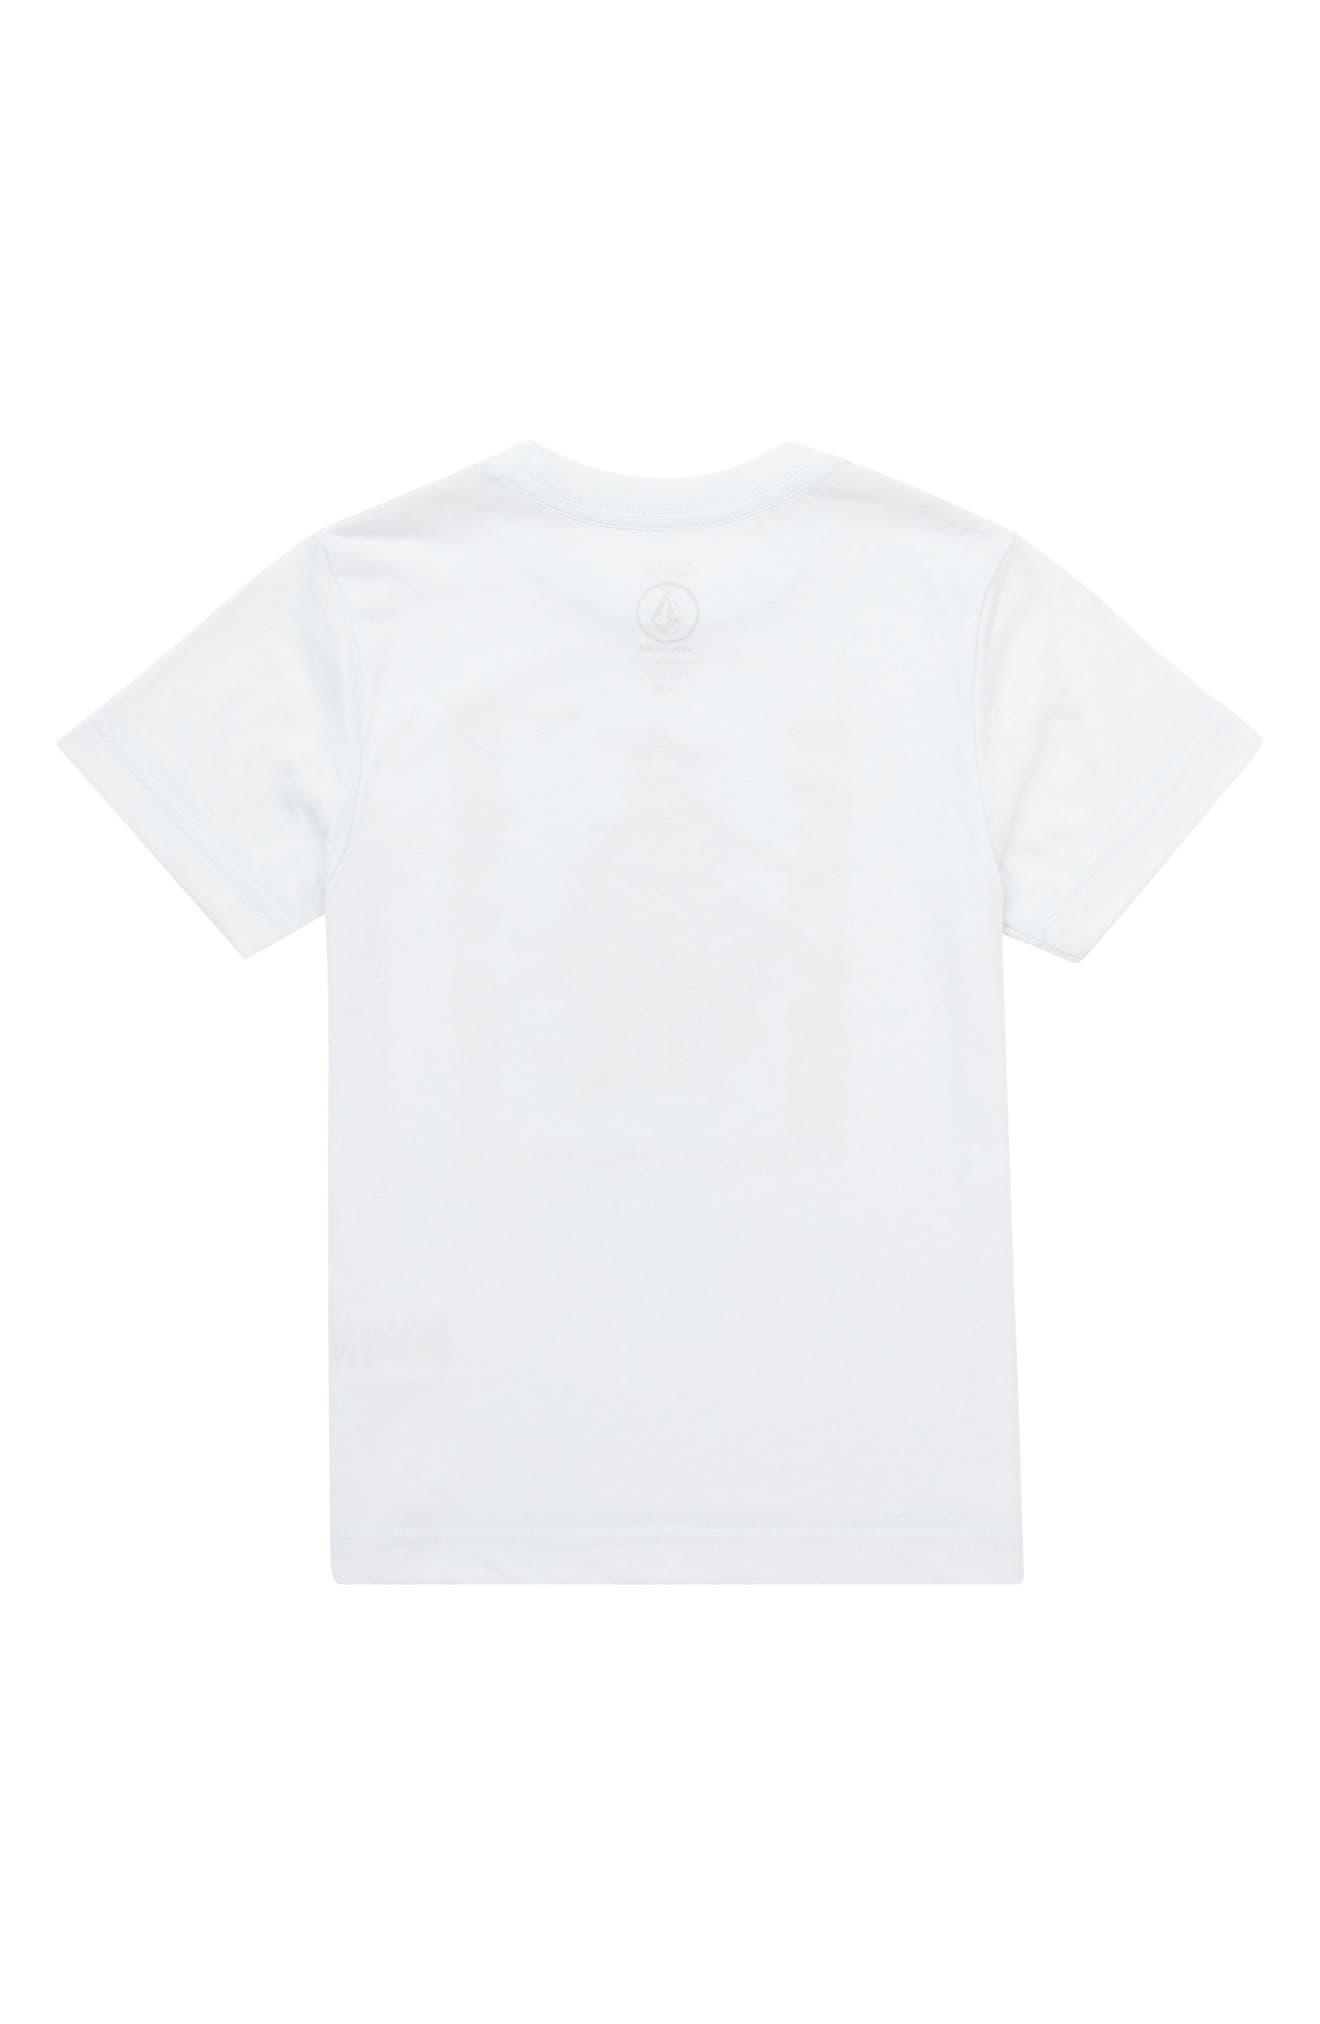 Peace Graphic T-Shirt,                             Alternate thumbnail 2, color,                             White